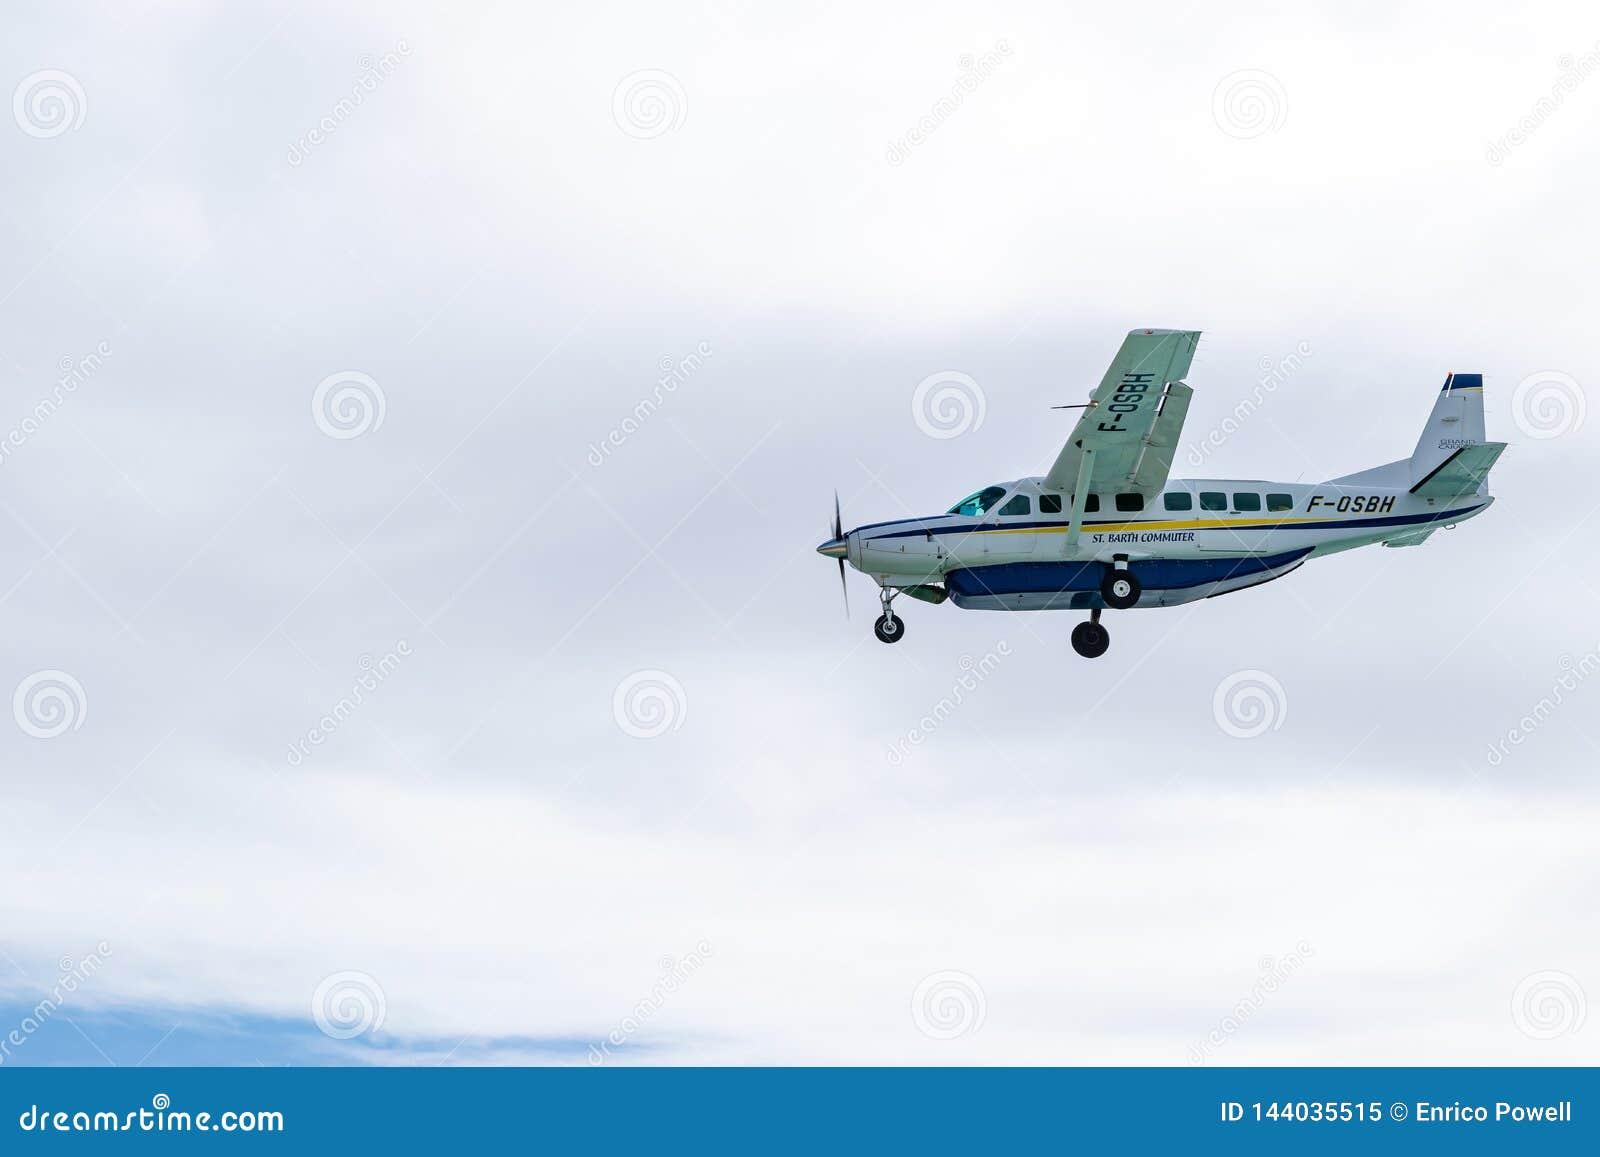 St Barth commuter aircraft F-OSBH, a Cessna 208B Grand Caravan regional airliner